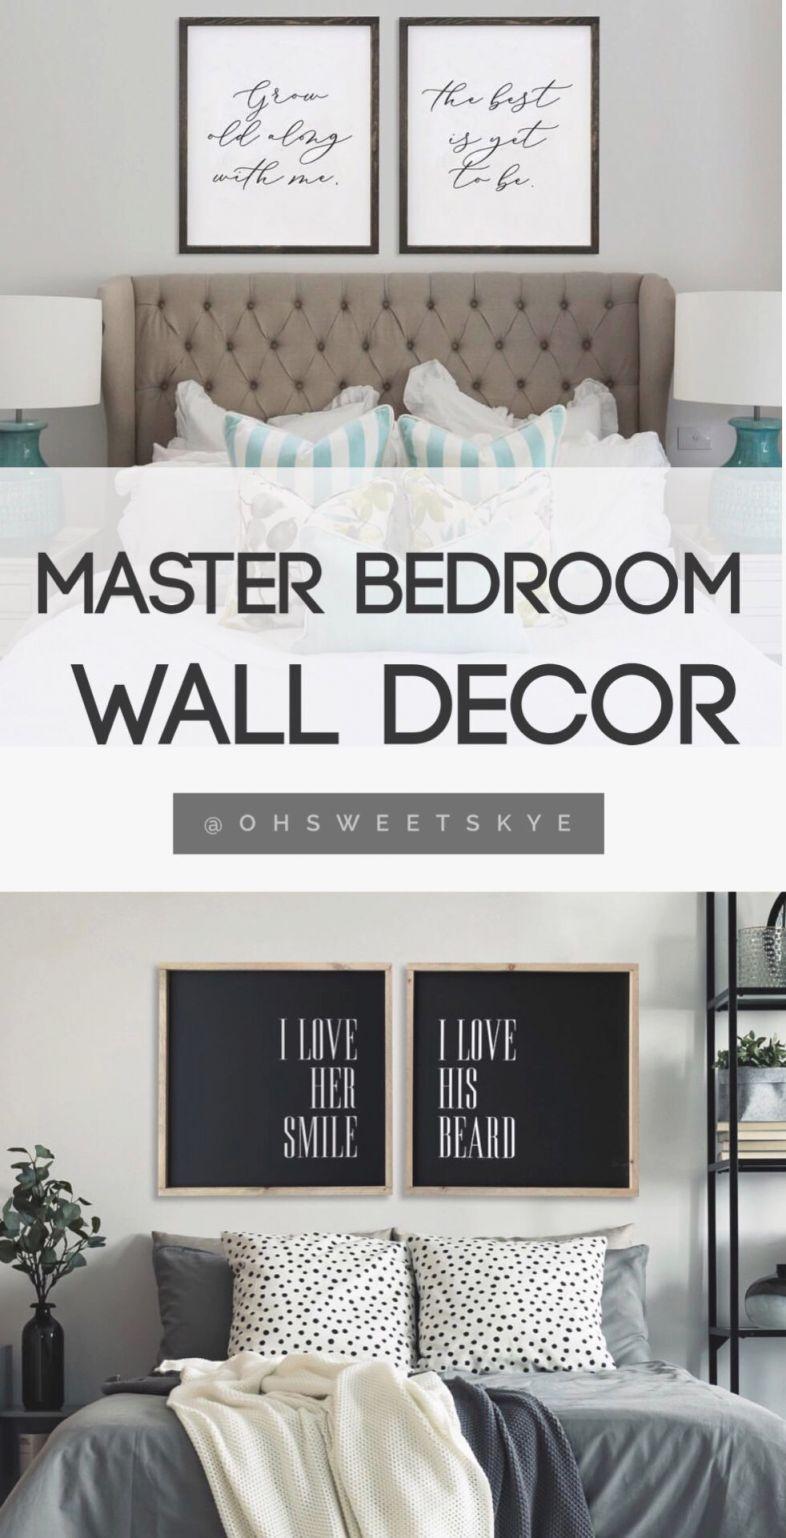 Bedroom Ideas : Master Wall Decor Decoration Decorating For in Master Bedroom Wall Decor Ideas